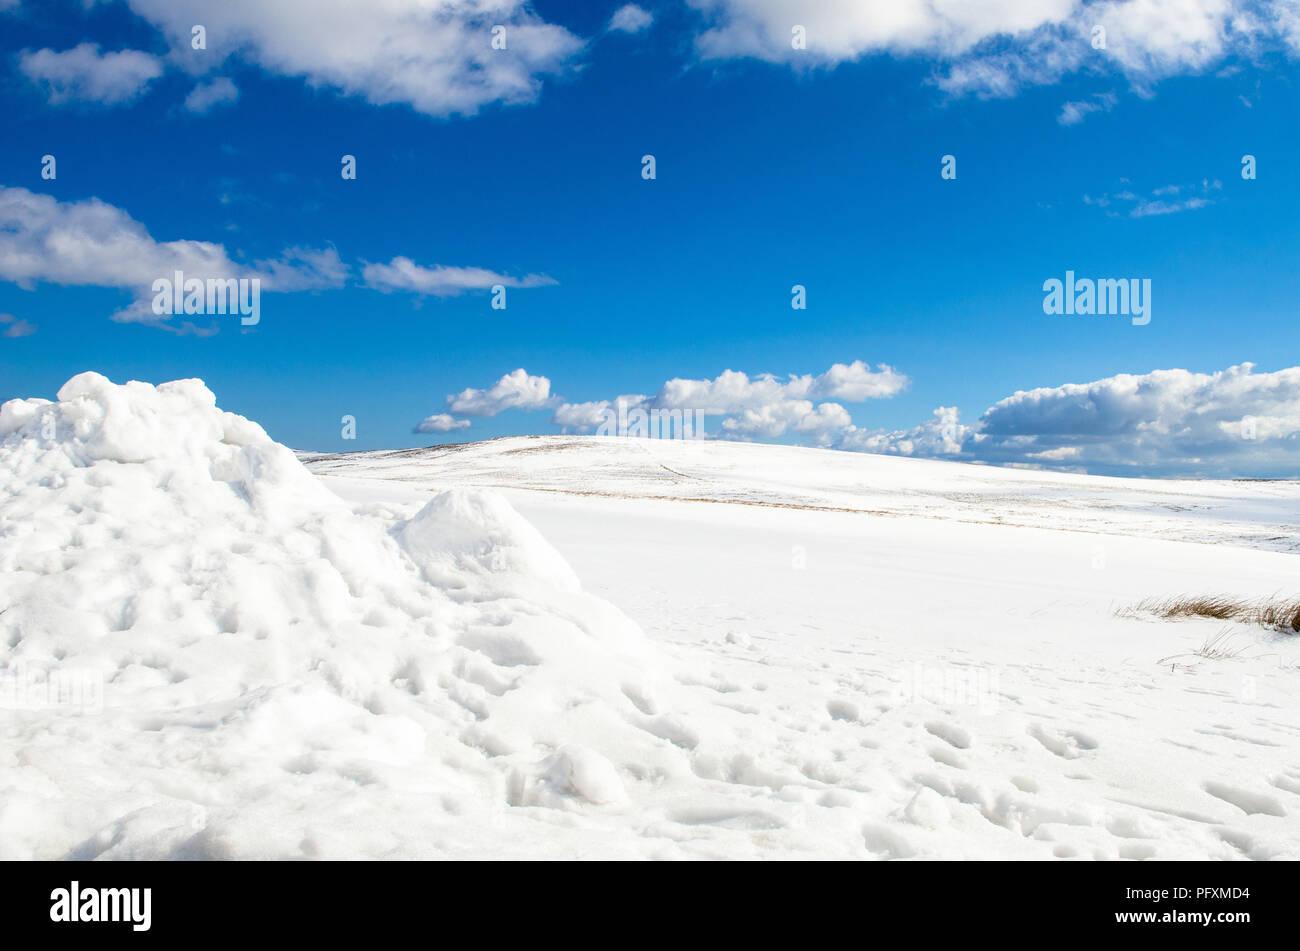 Divis and Black Mountain walk Belfast Hills Snow covered Nation Trust Belfast Northern Ireland - Stock Image